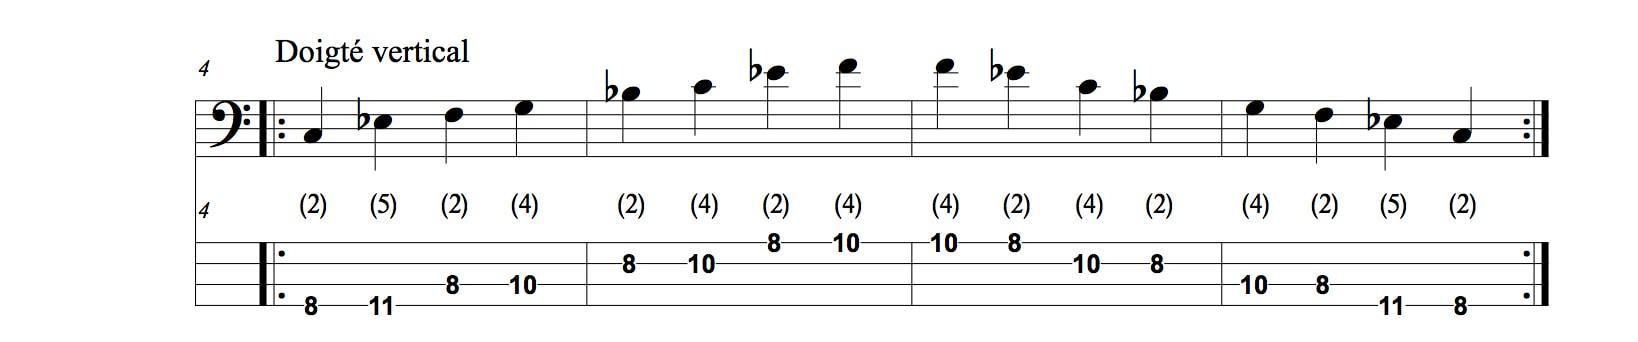 gamme mineure pentatonique a la guitare basse 3